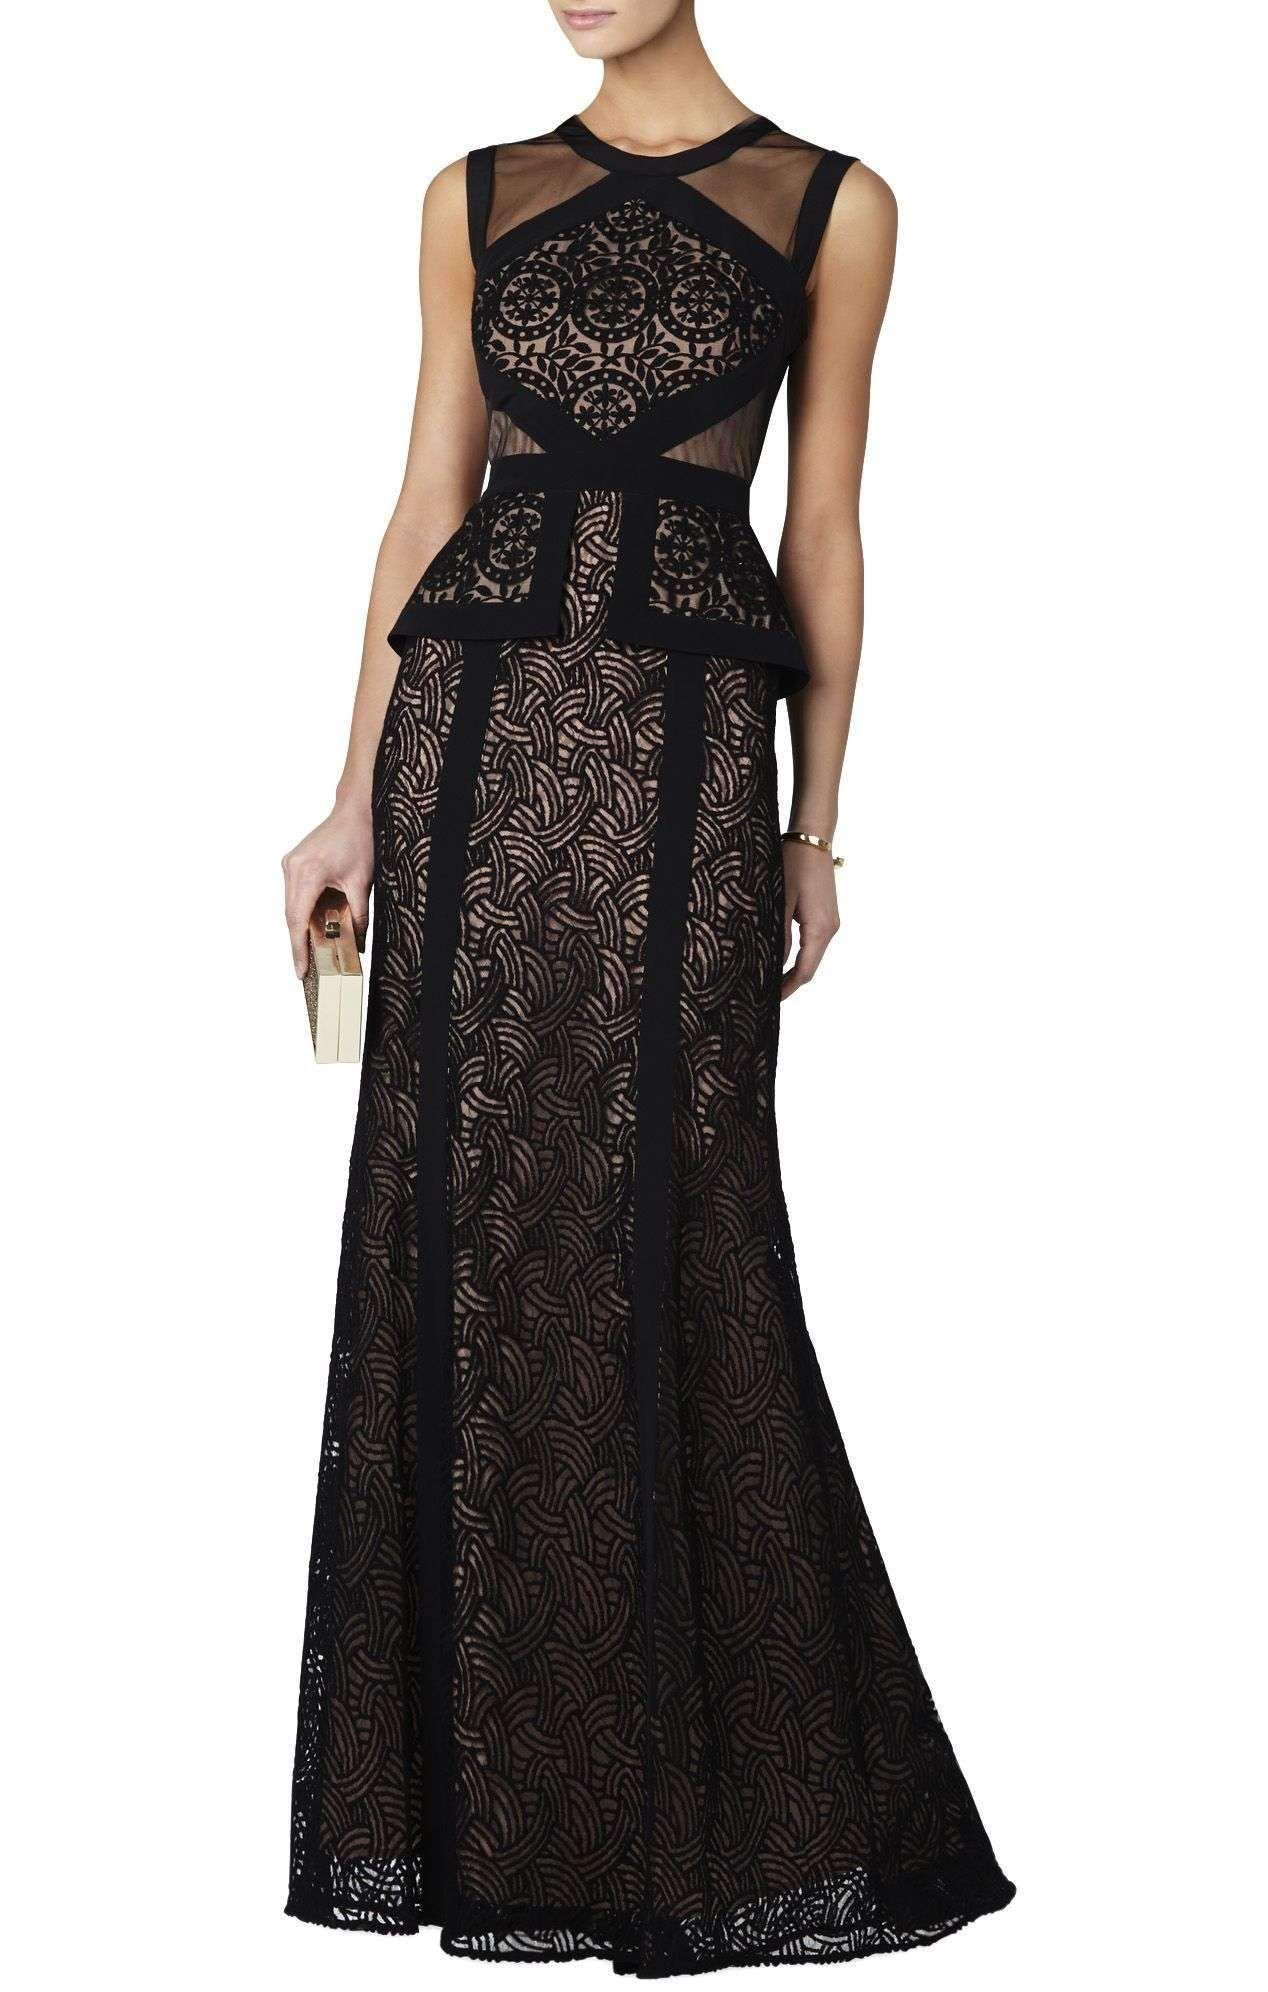 347d5f925496 BCBGMaxazria Viviana Sleeveless Peplum Gown Dress in 2019 | Products ...